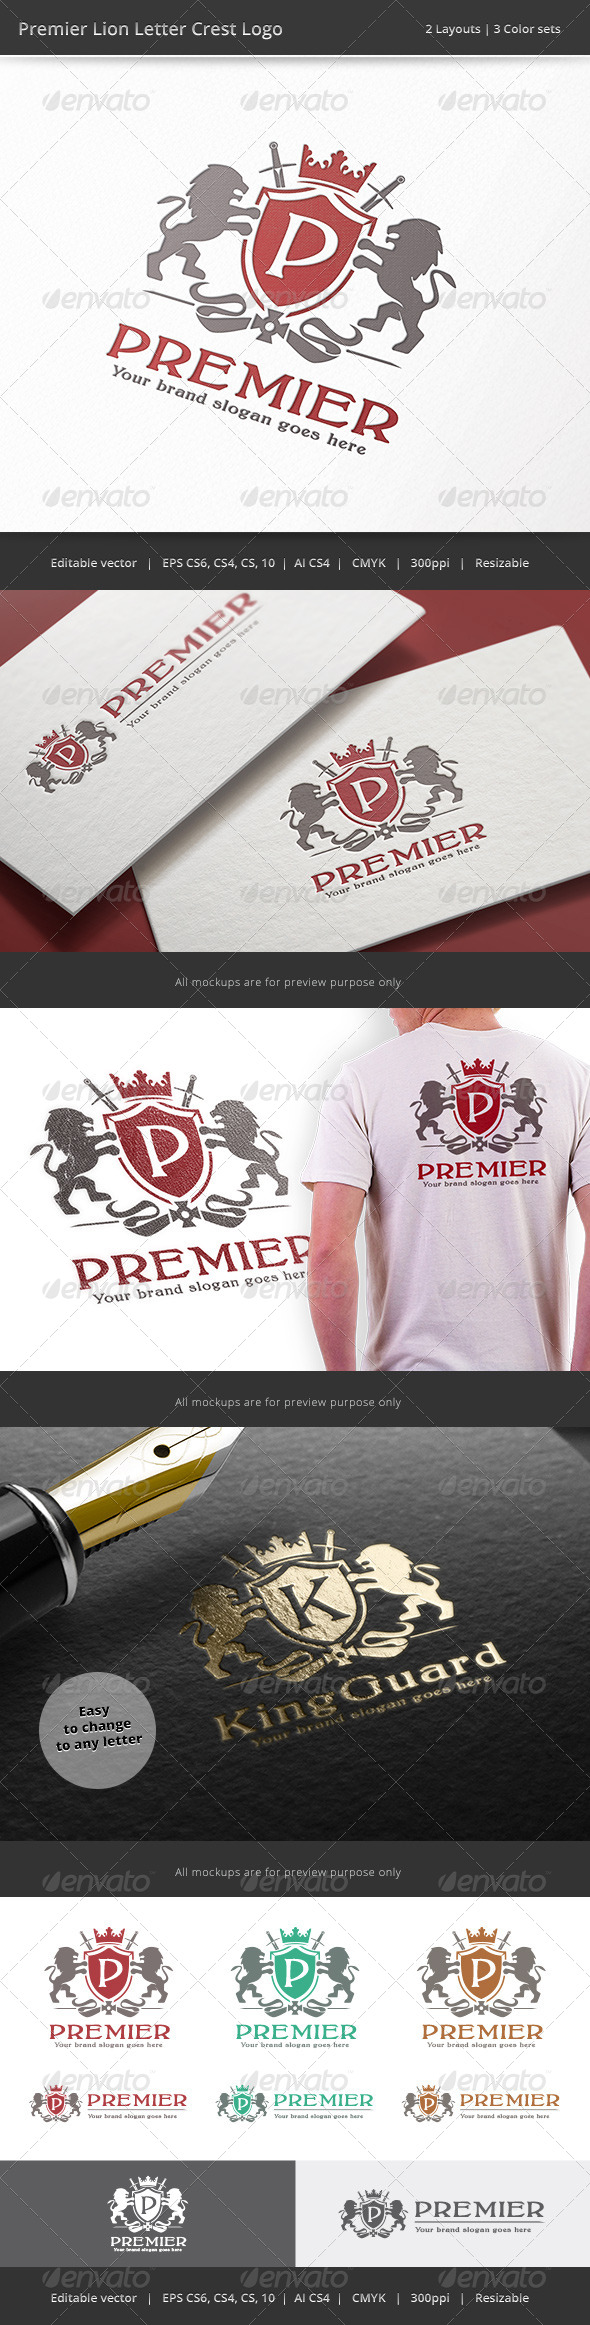 Premier Lion Letter Crest Logo